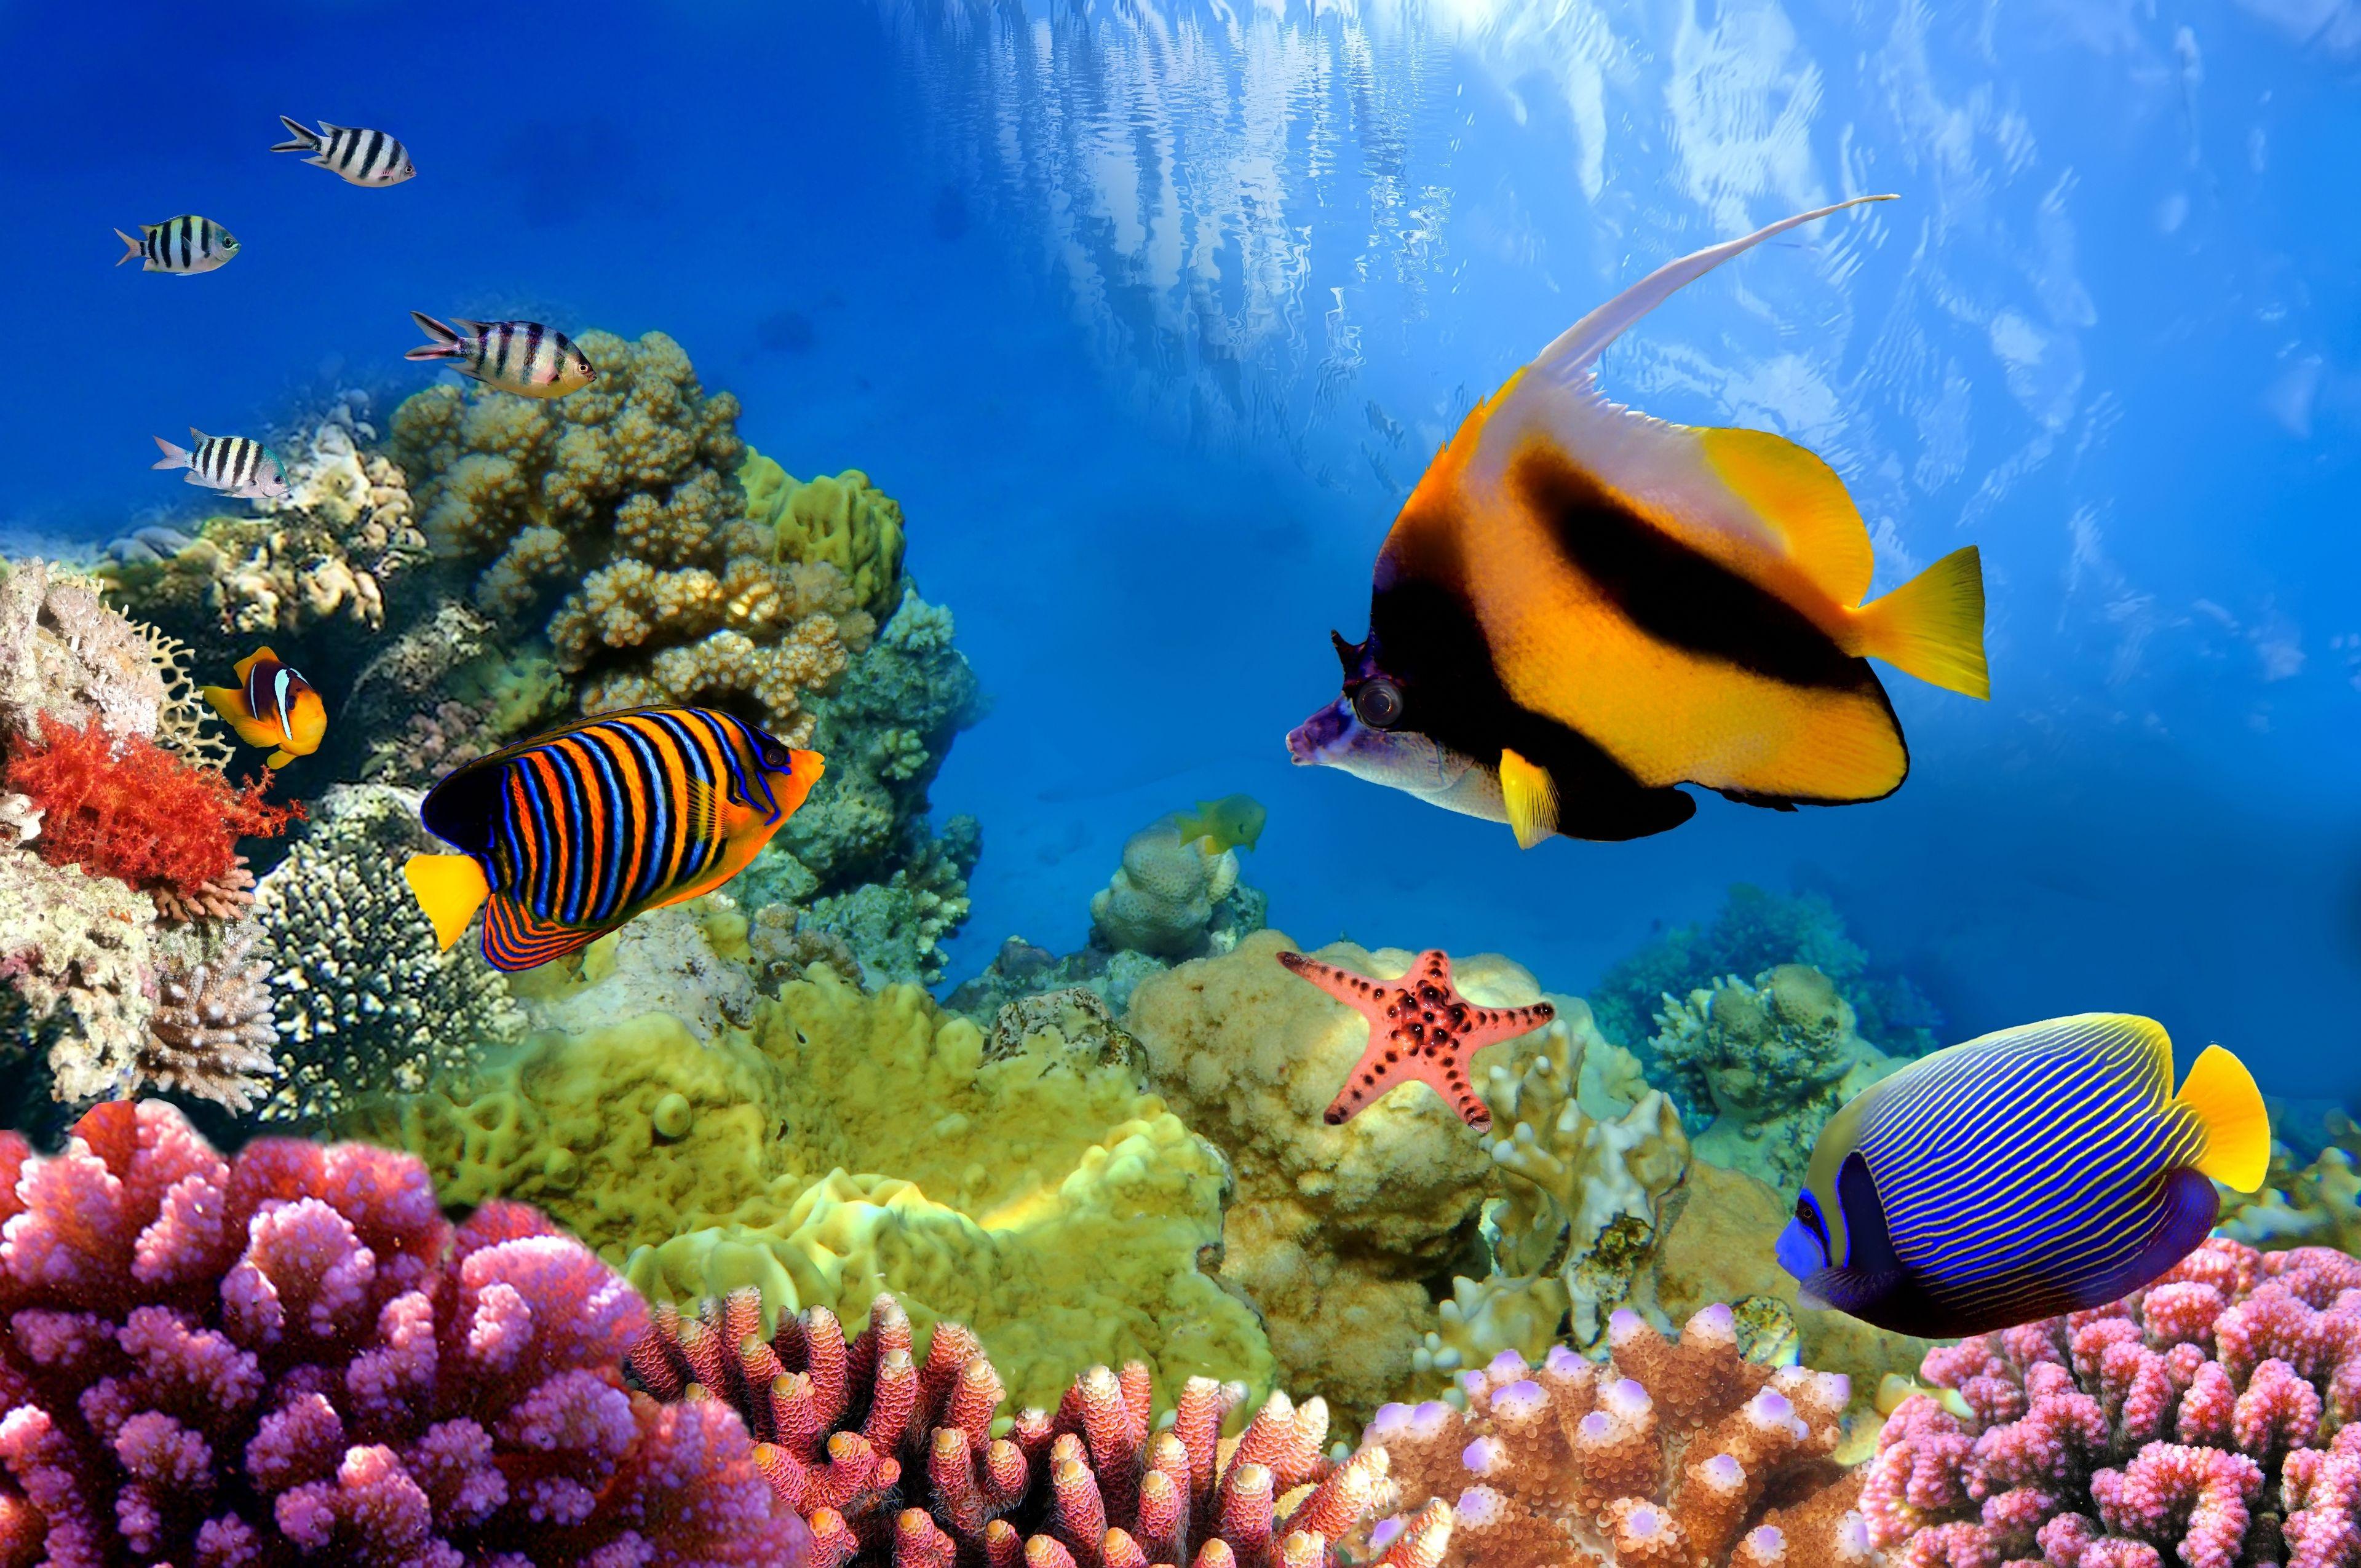 Znalezione obrazy dla zapytania tapety na pulpit koralowa rafa